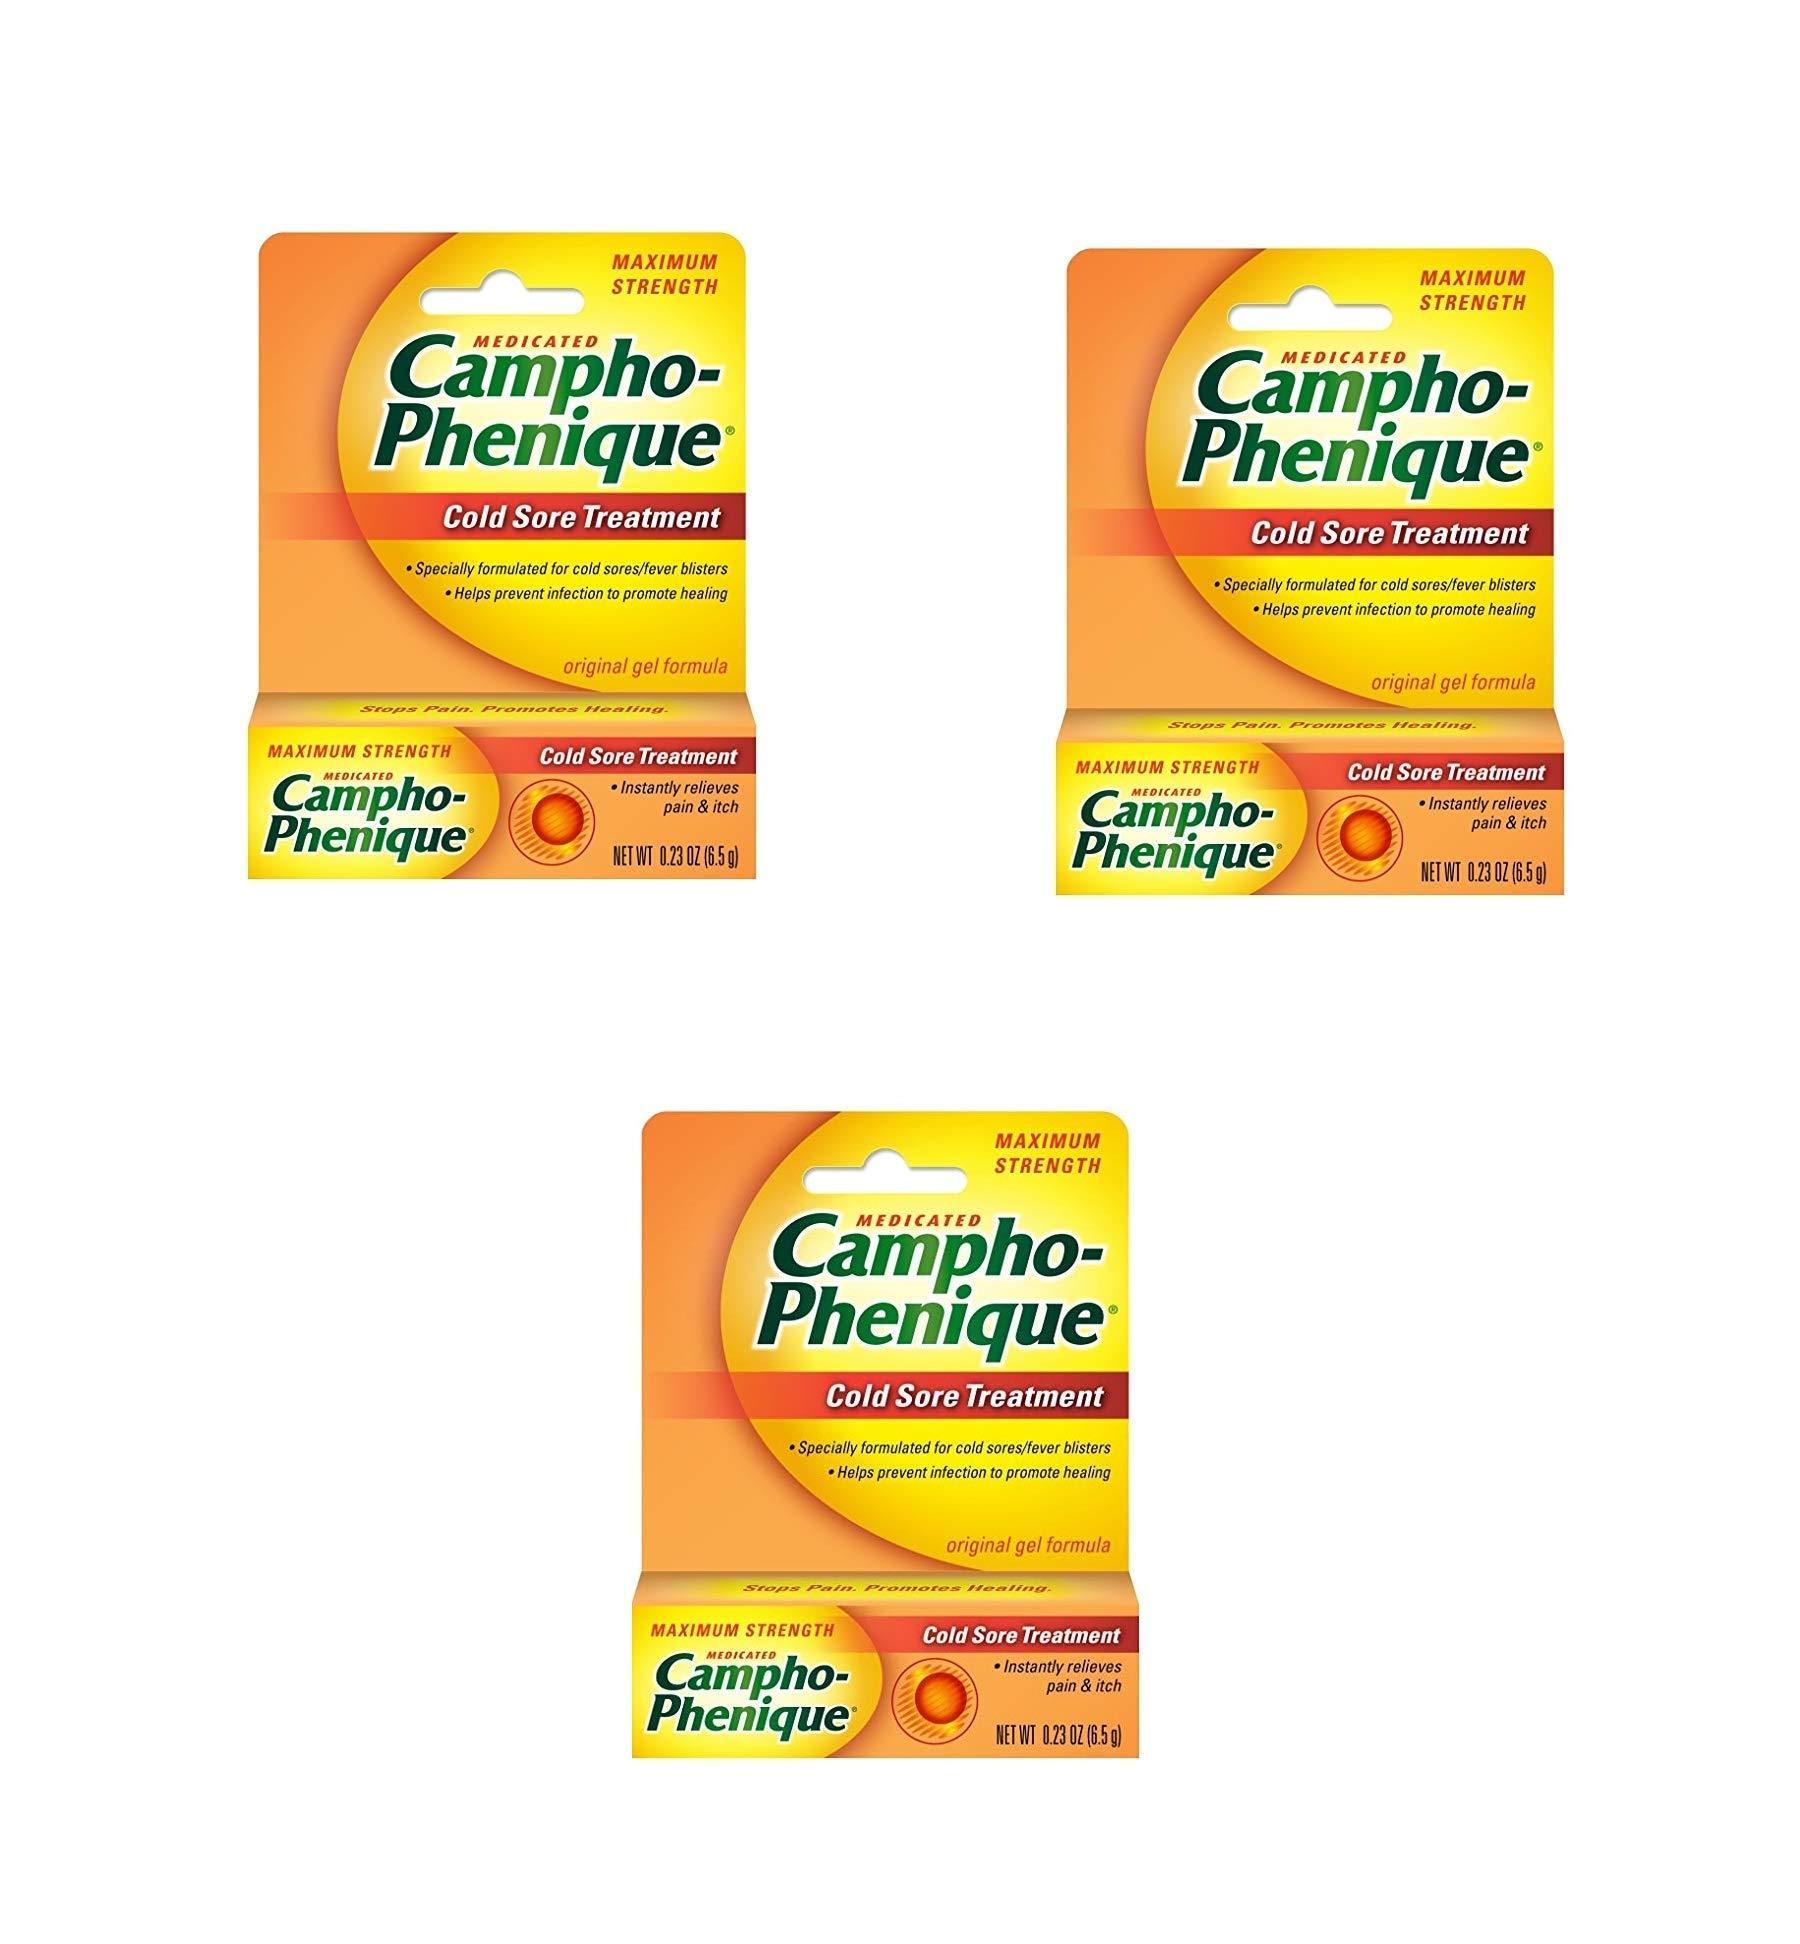 Campho-Phenique Cold Sore Treatment, Maximum Strength, 0.23 Ounce (3)